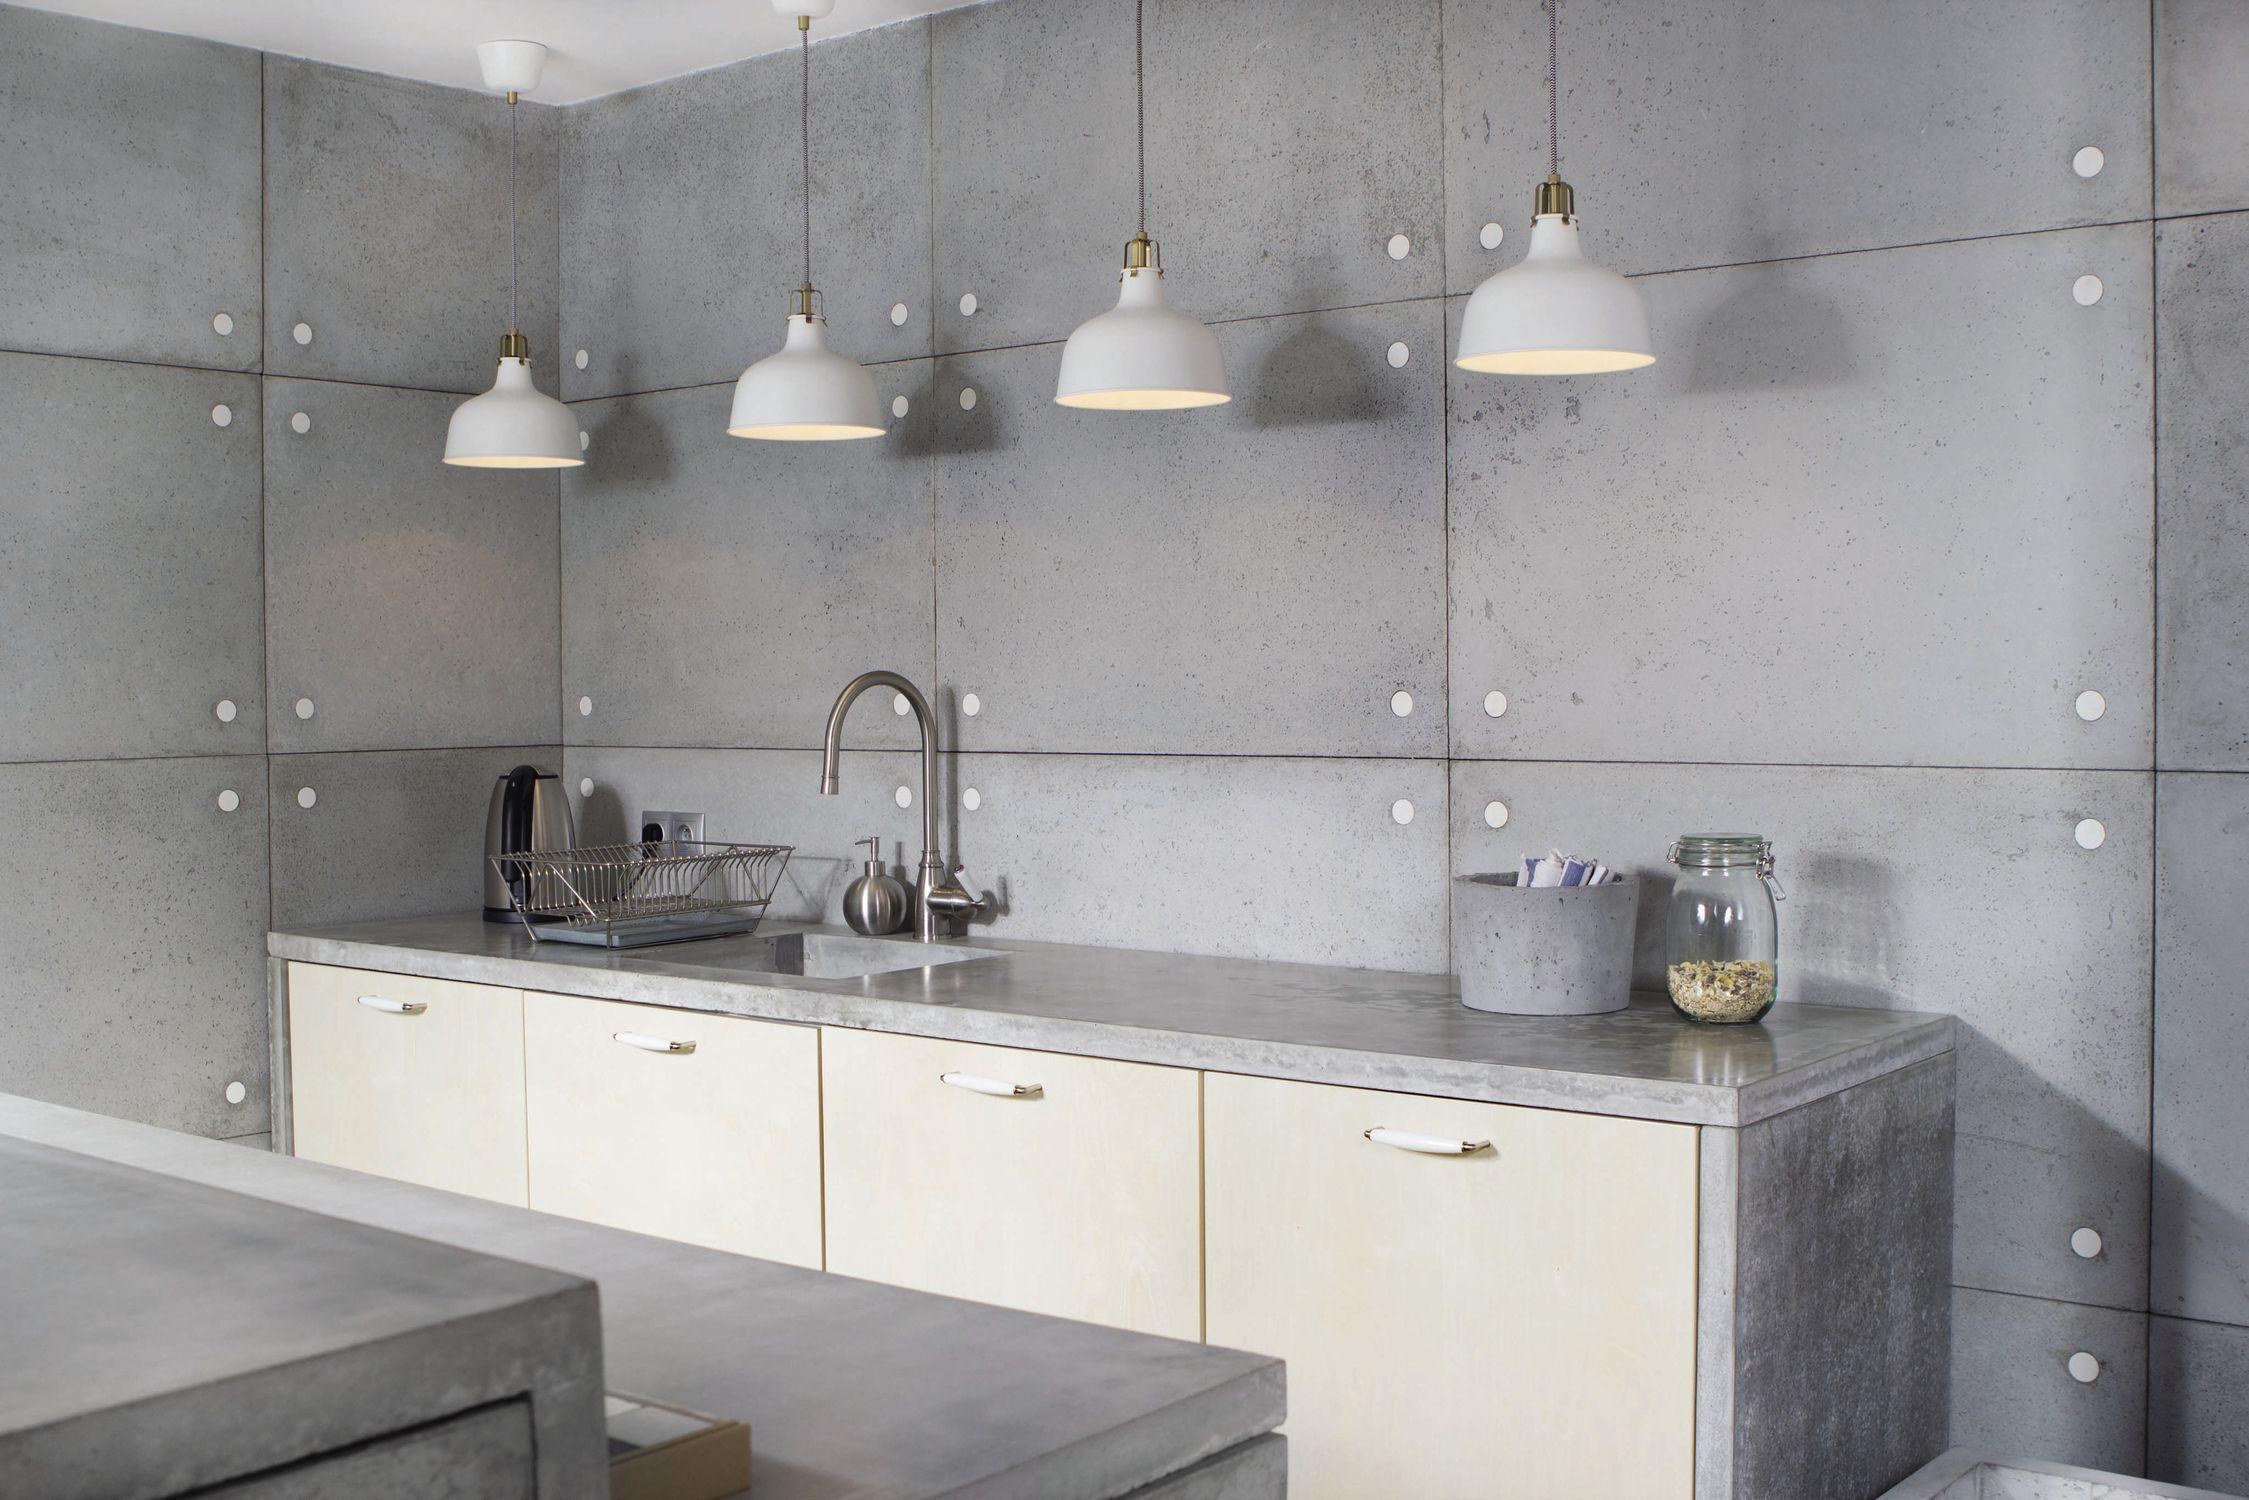 Encimera de hormigón / para cocina - CONCRETE - Living Concrete Ltd